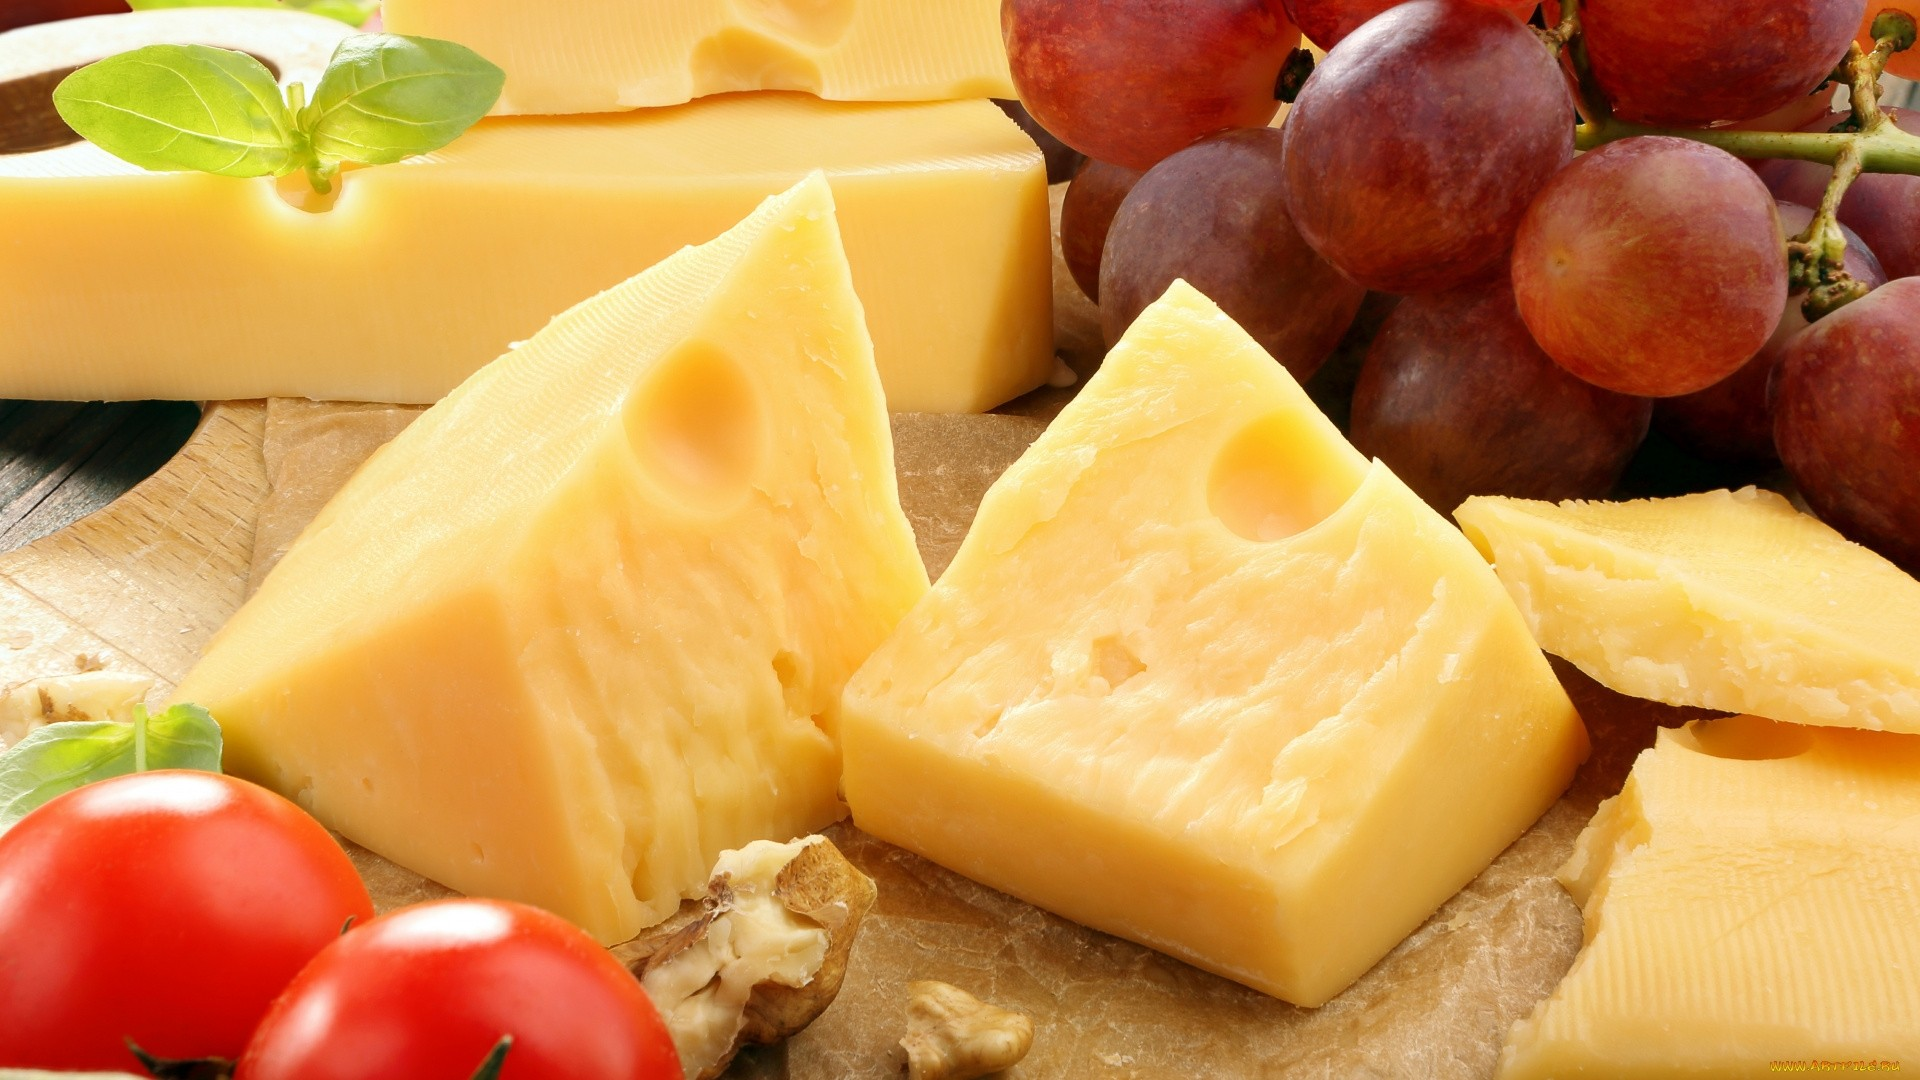 Cheese Wallpaper HD